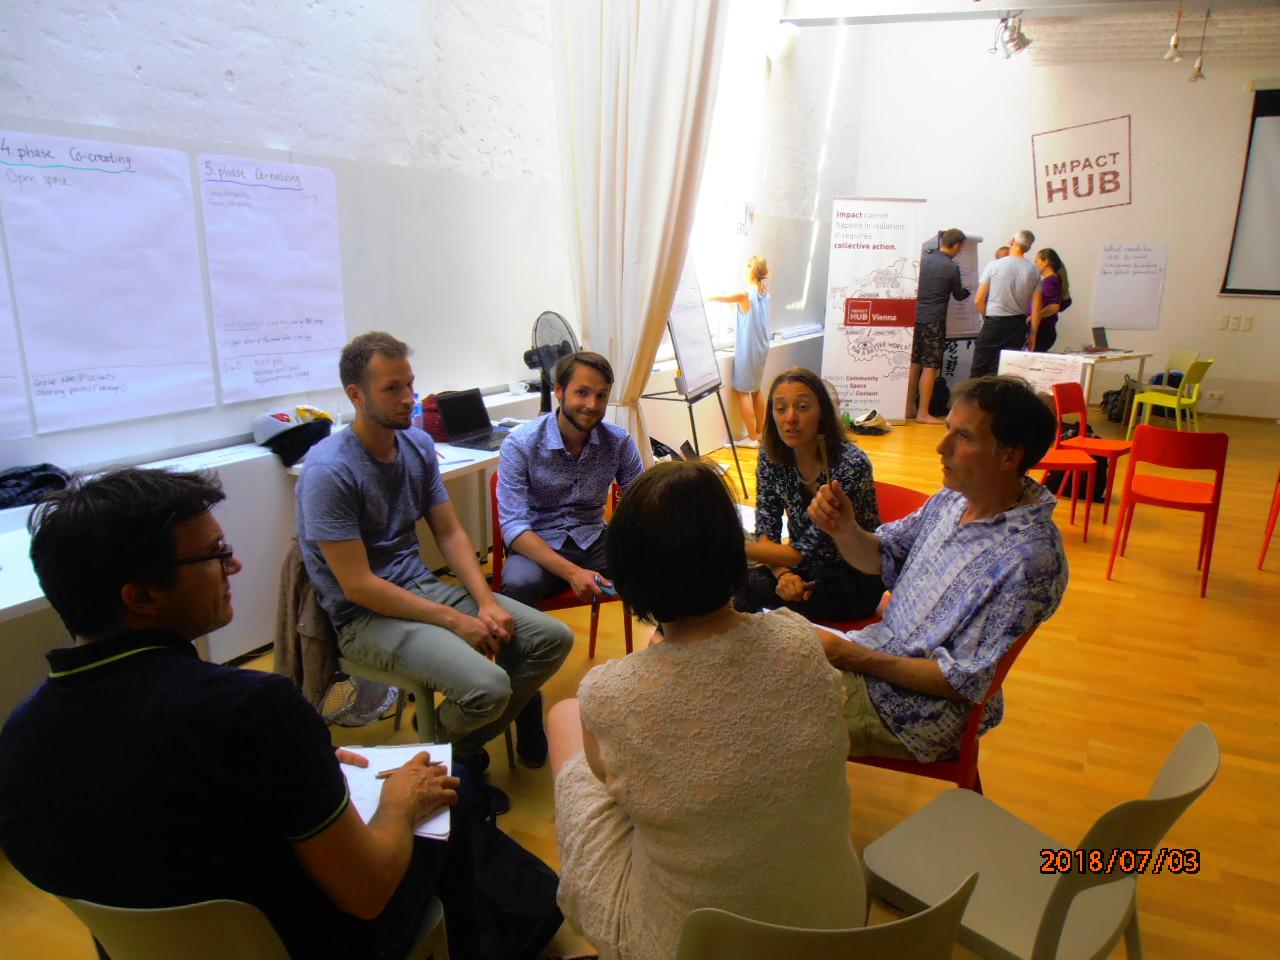 Small dialog group